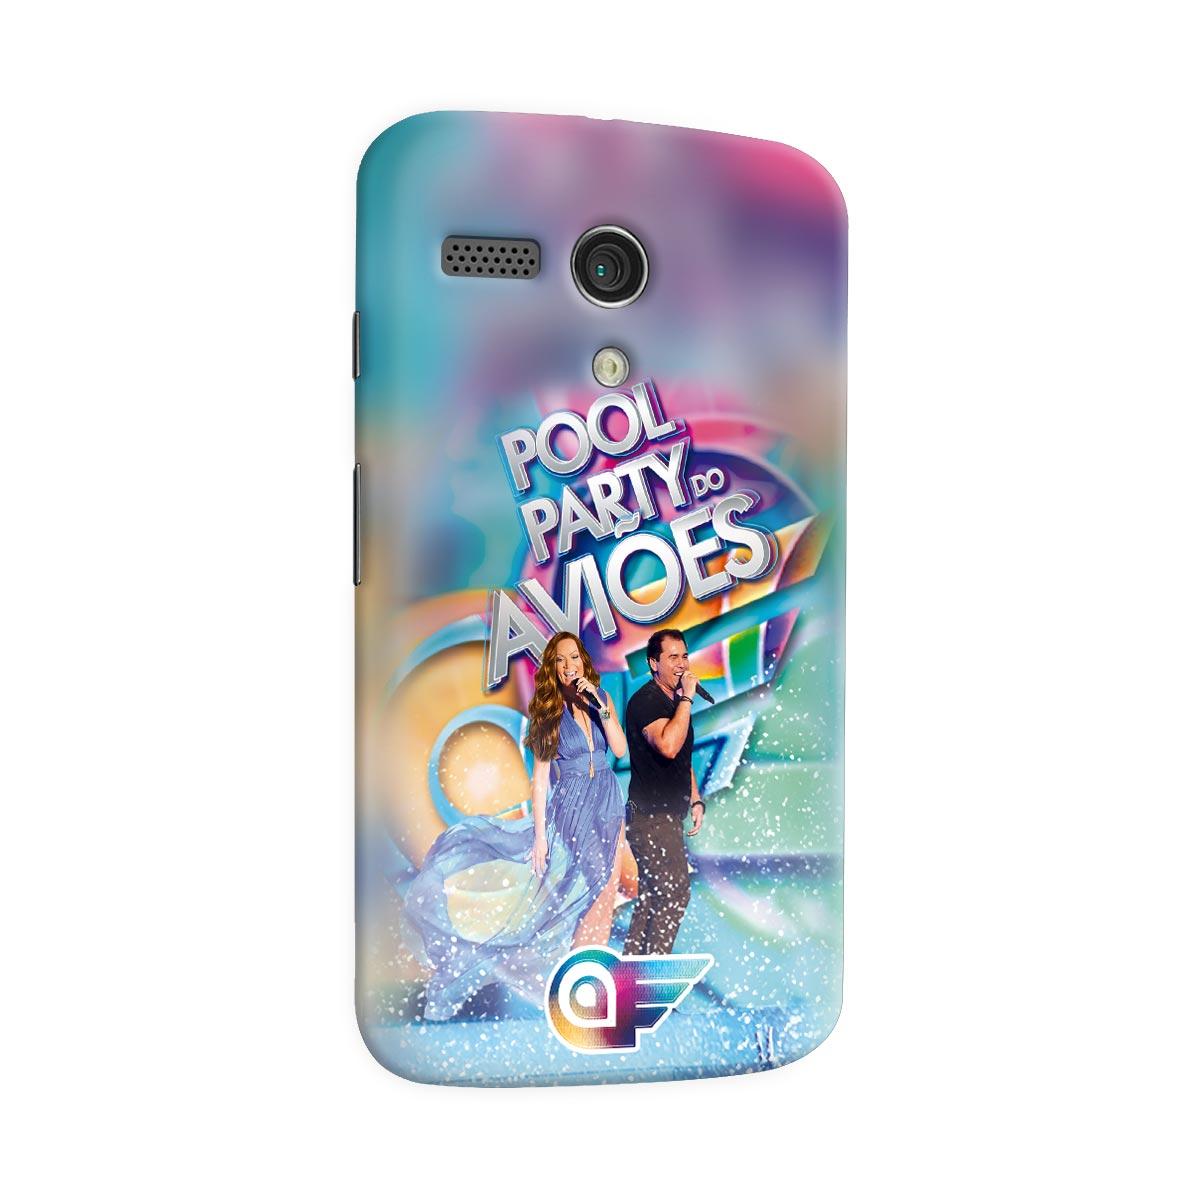 Capa para Motorola Moto G 1 Aviões do Forró Capa Pool Party